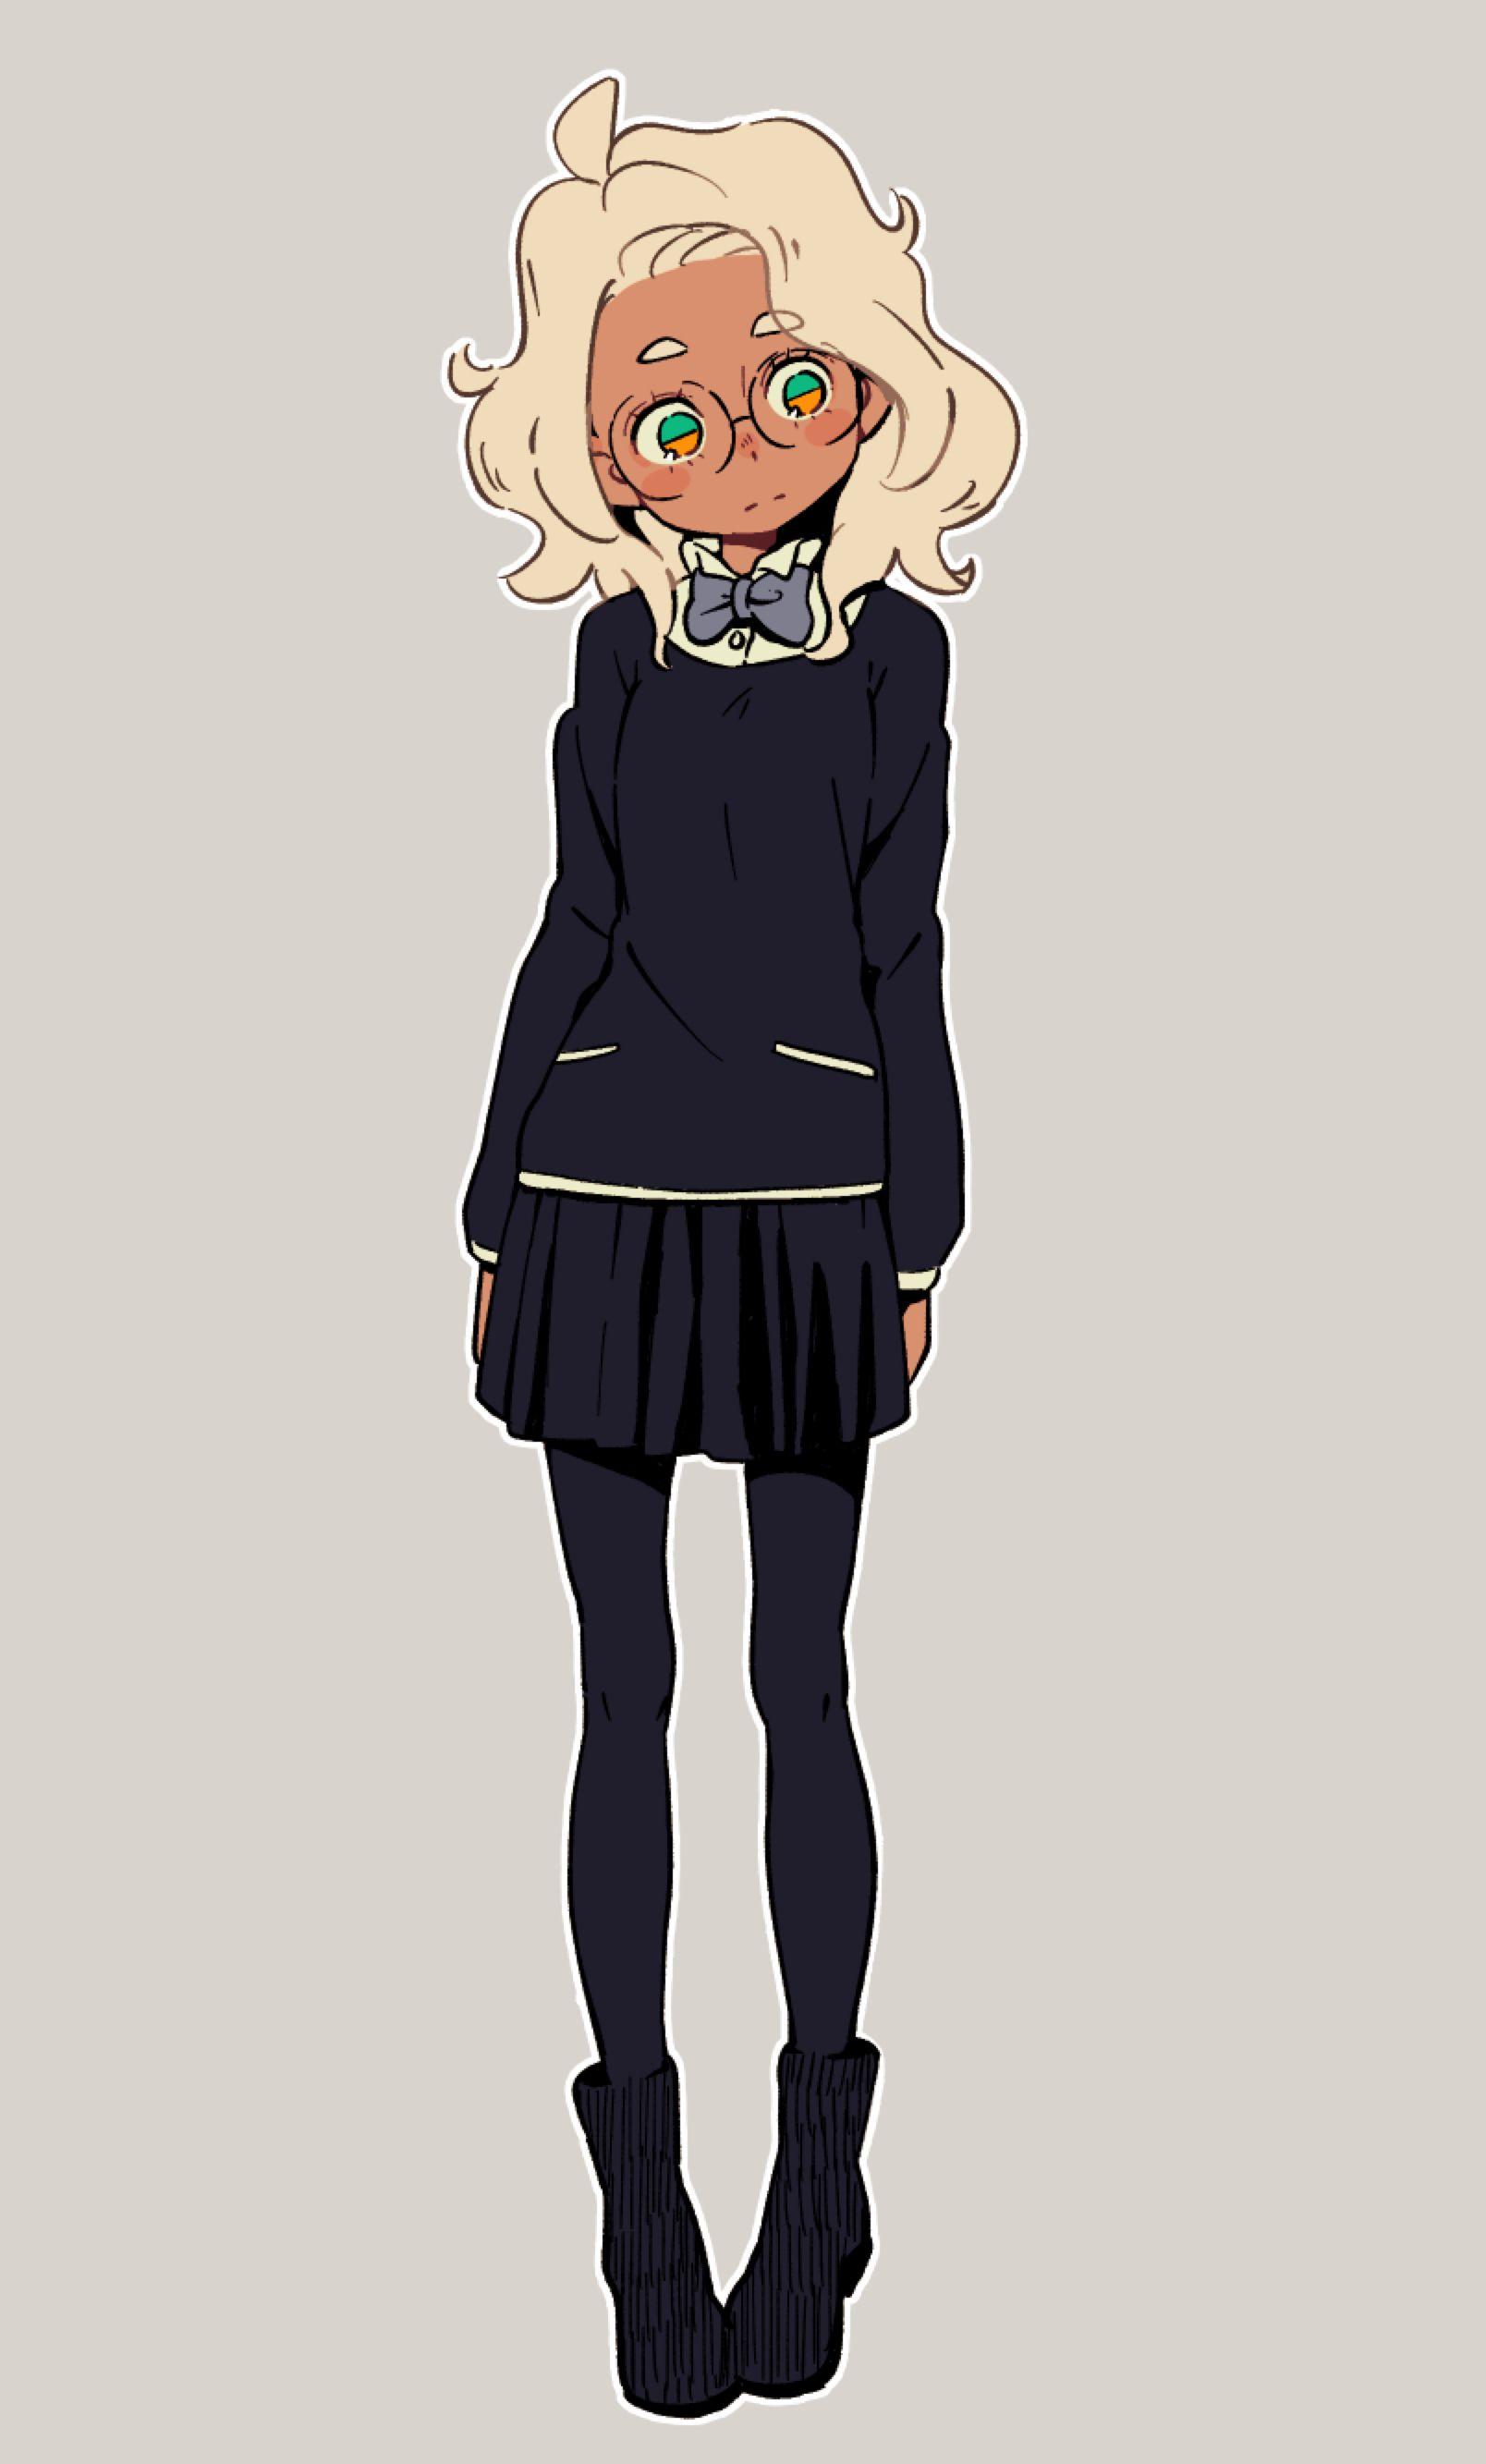 Girl by monionium on DeviantArt Character art